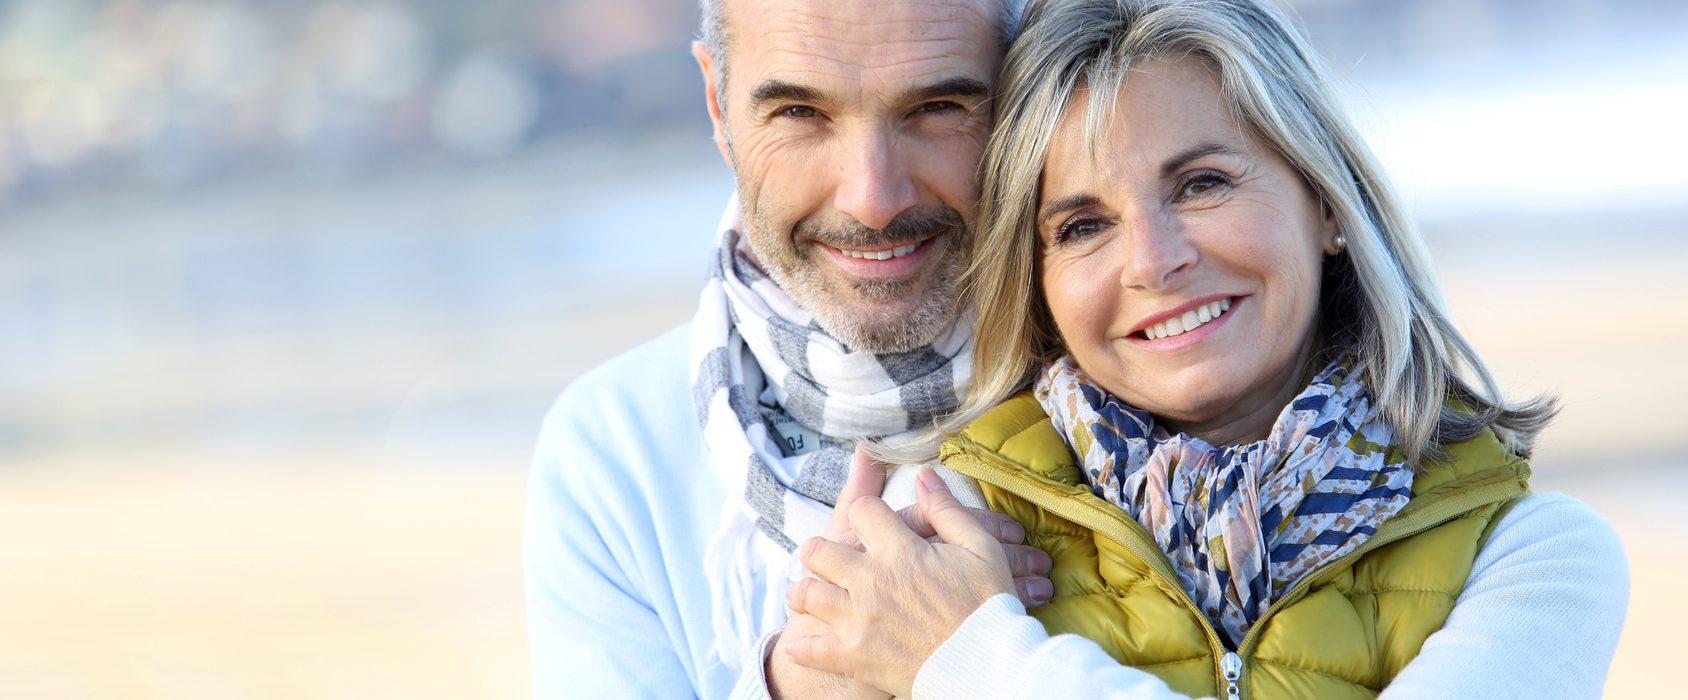 Kidney stones and myocardial infarction